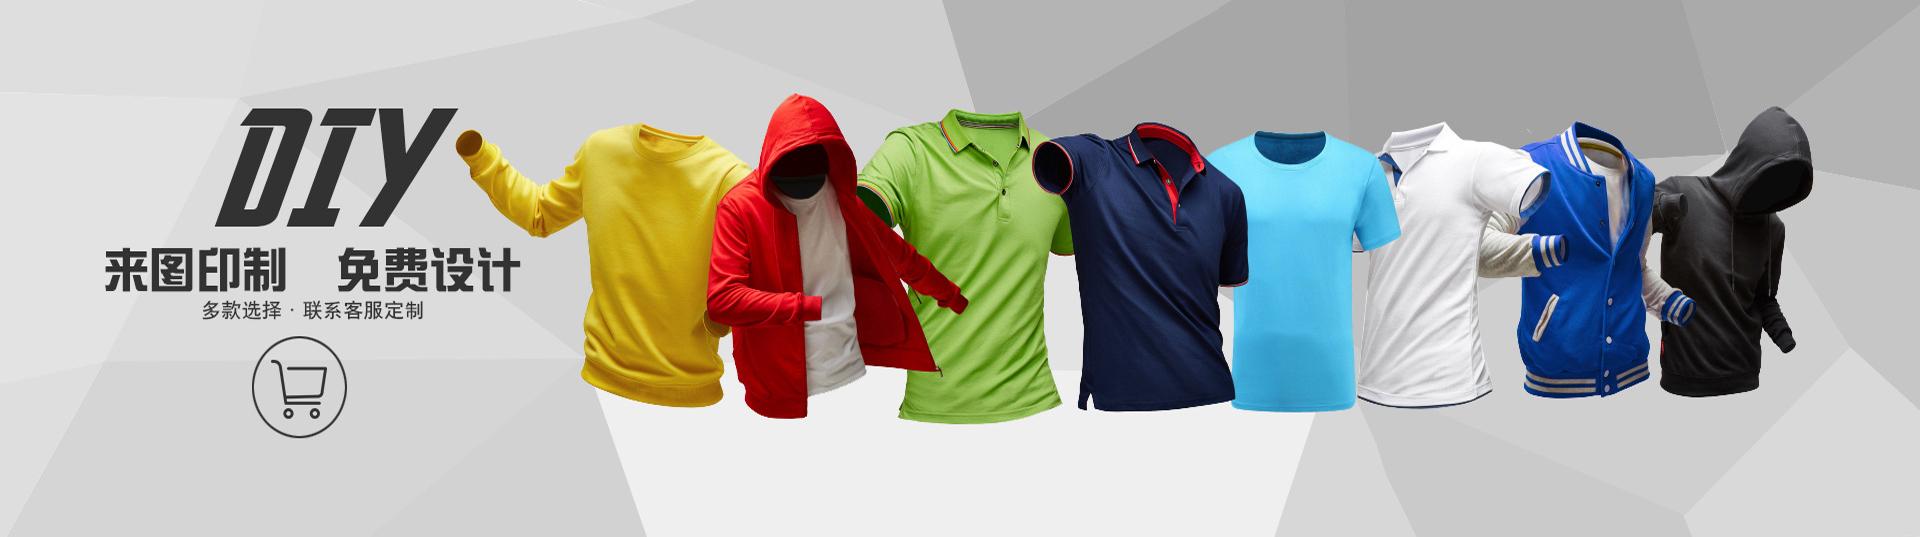 北京vwin官方网站